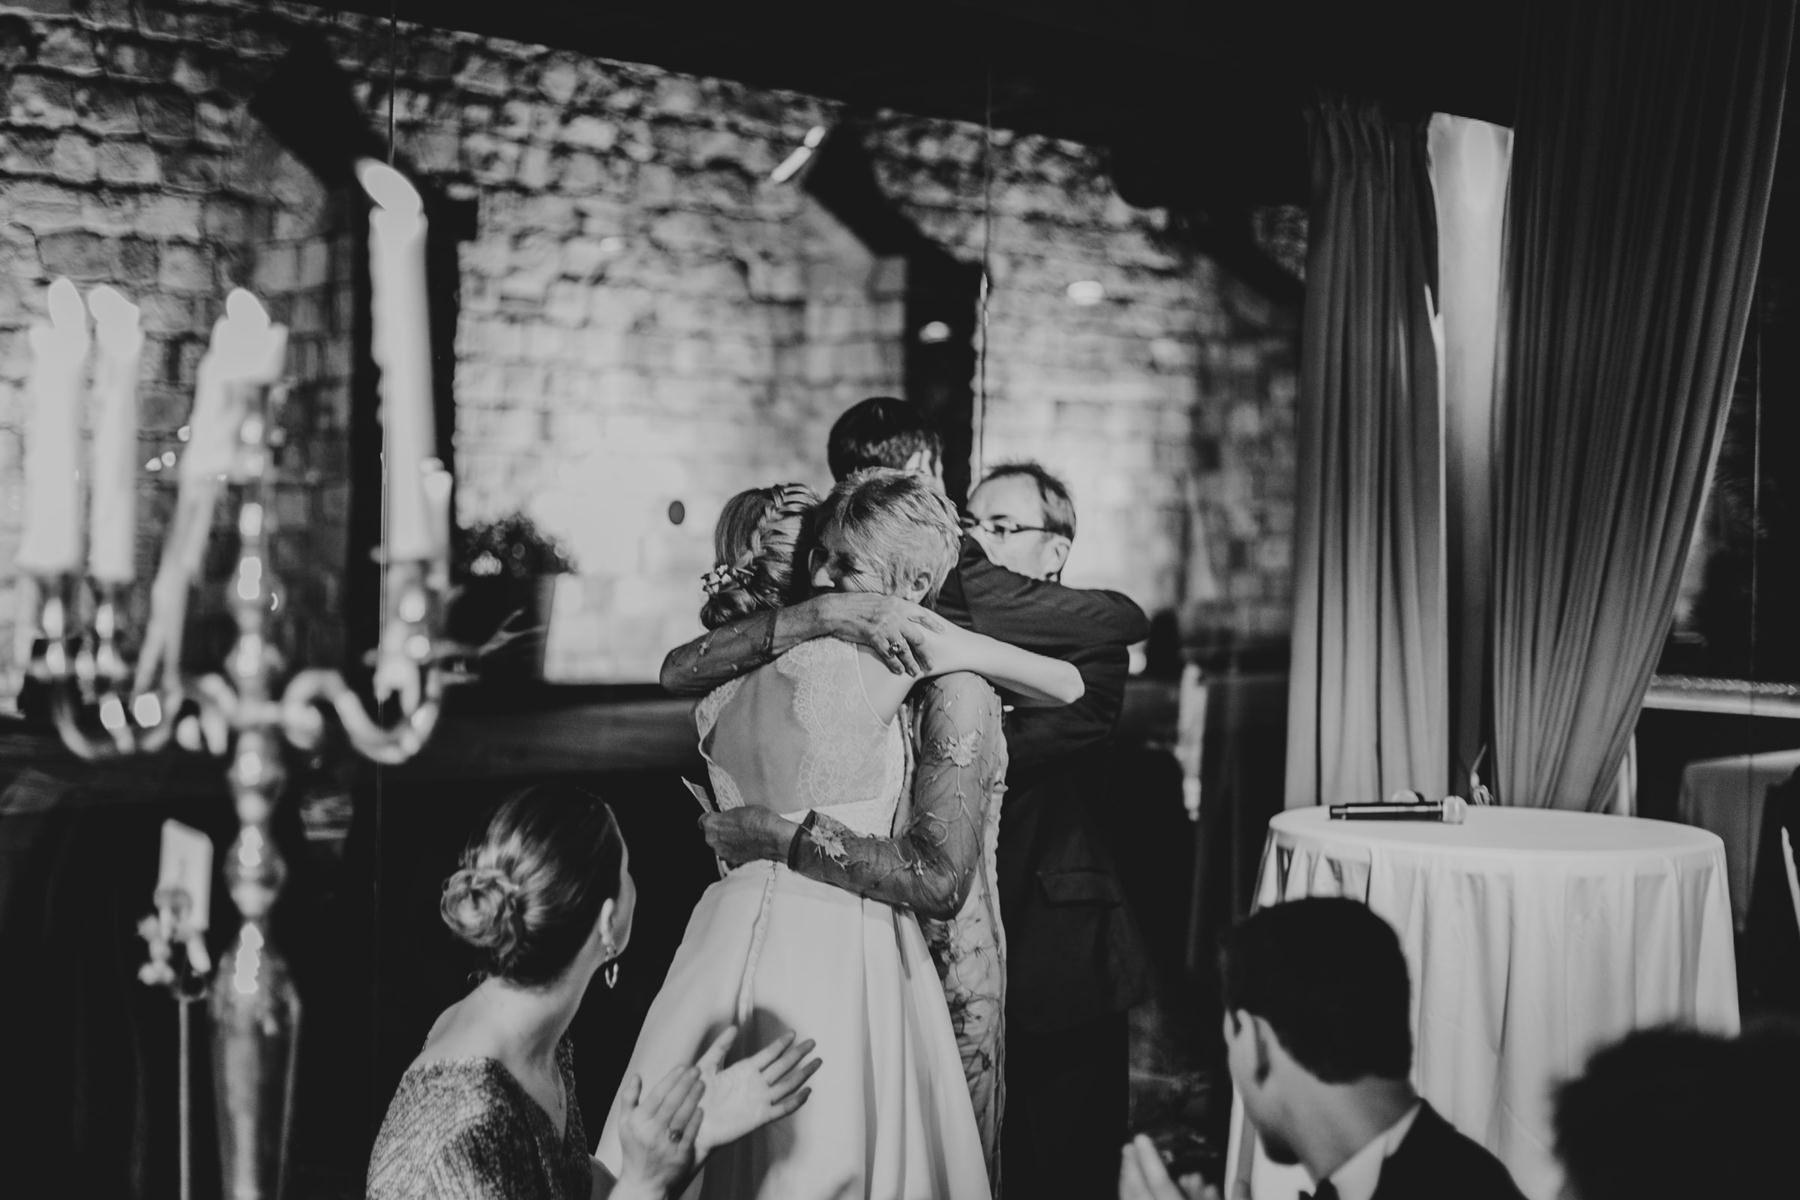 Wedding_Photography_Carlos_Hevia_Barcelona_Berlin_48.jpg